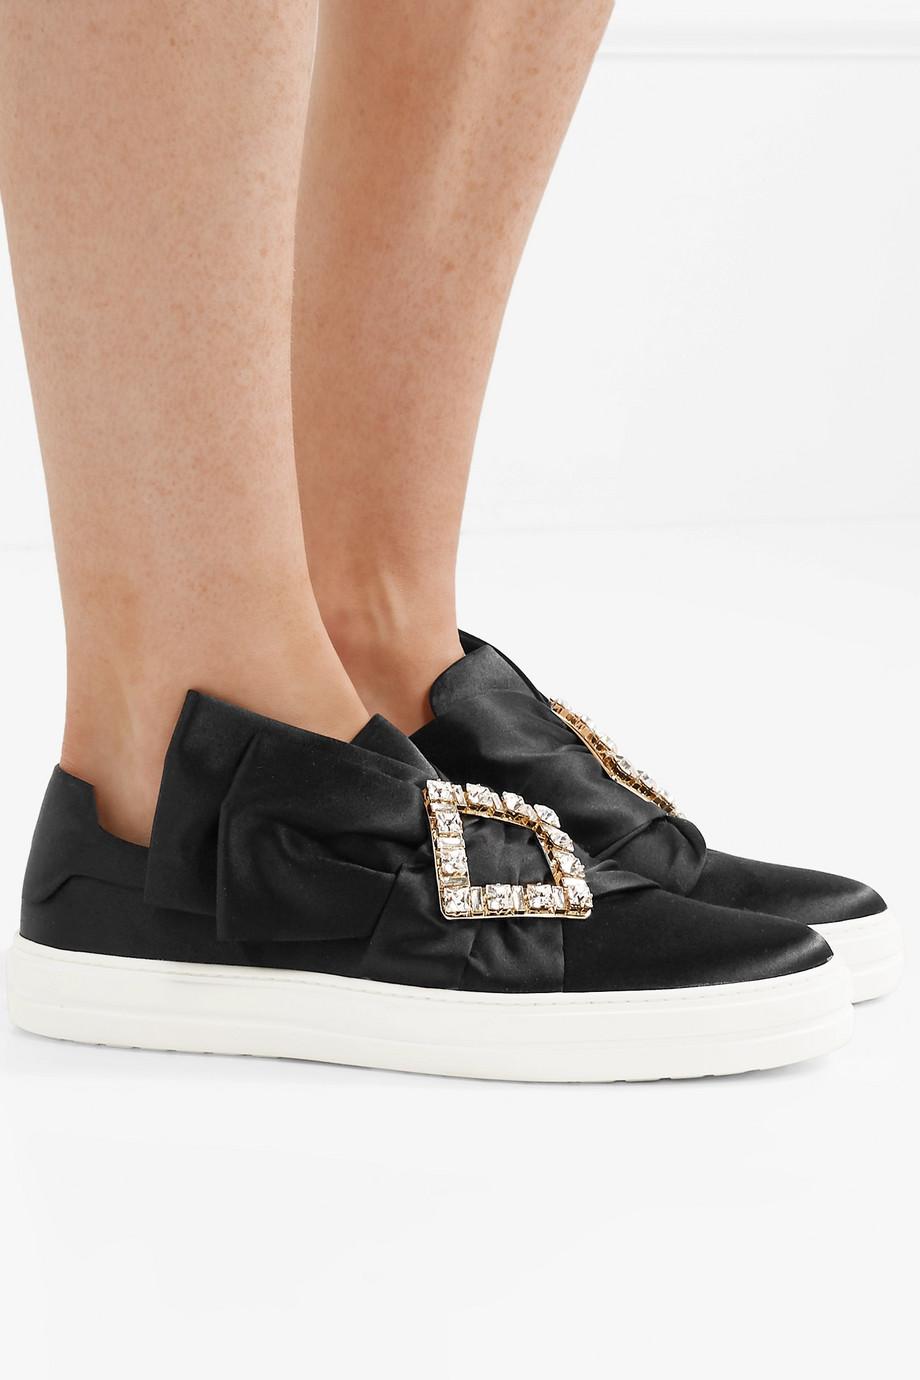 Roger Vivier Sneaky Viv crystal-embellished satin slip-on sneakers